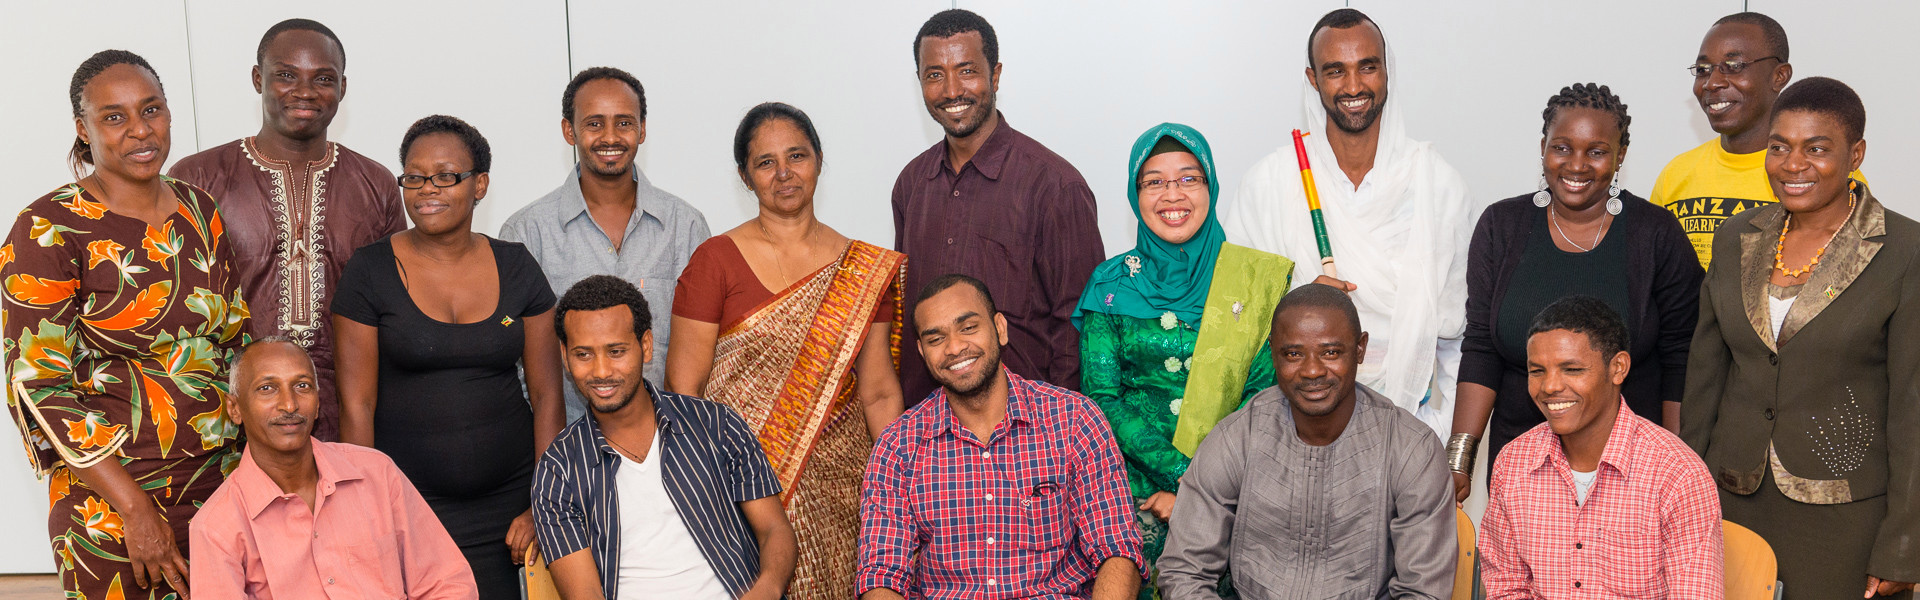 groepsfoto international students